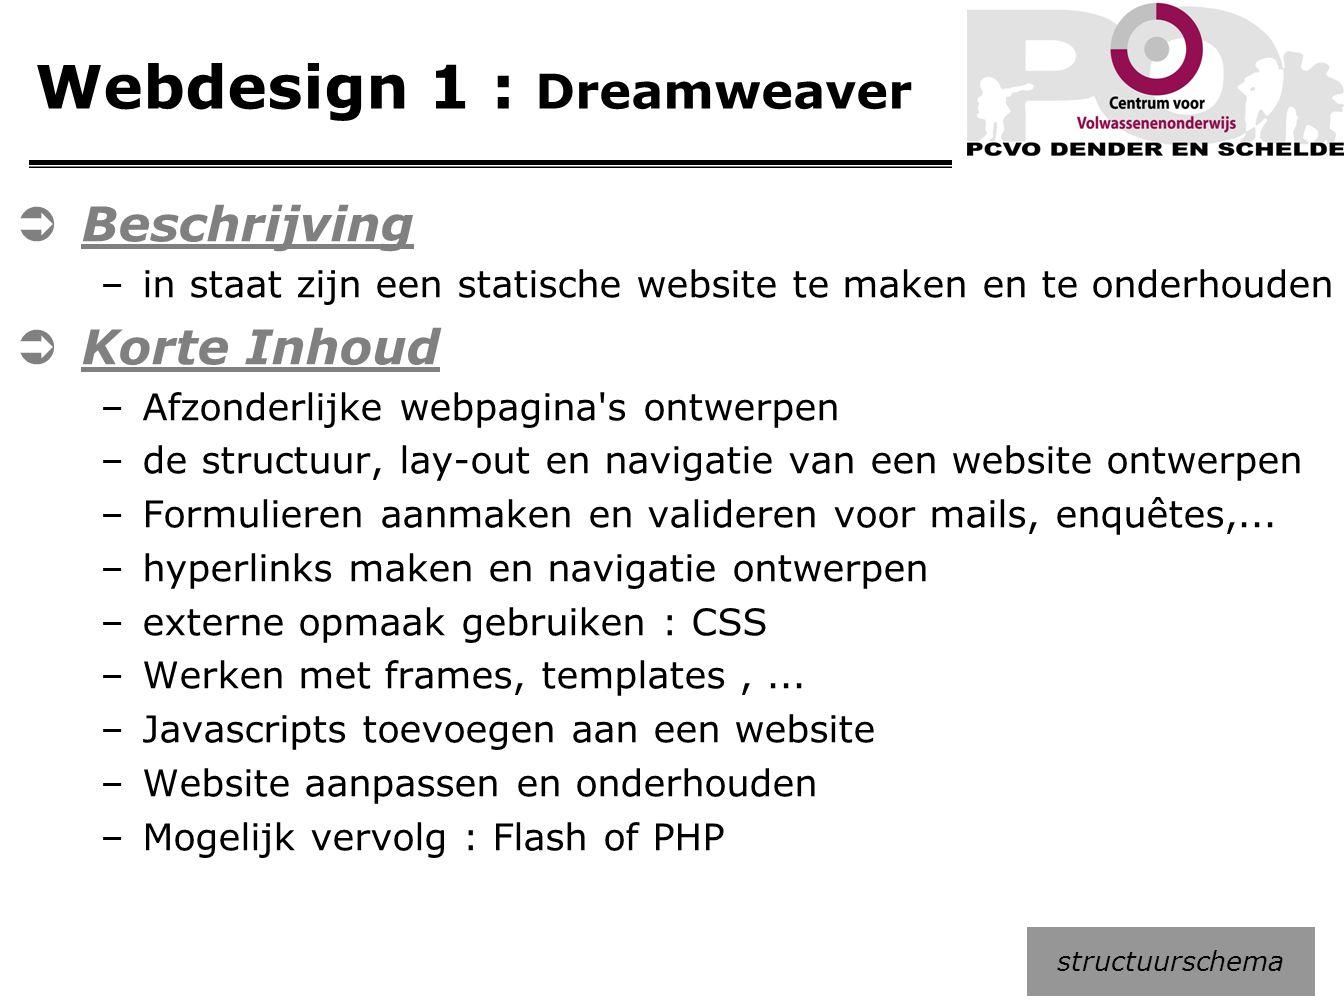 Webdesign 1 : Dreamweaver